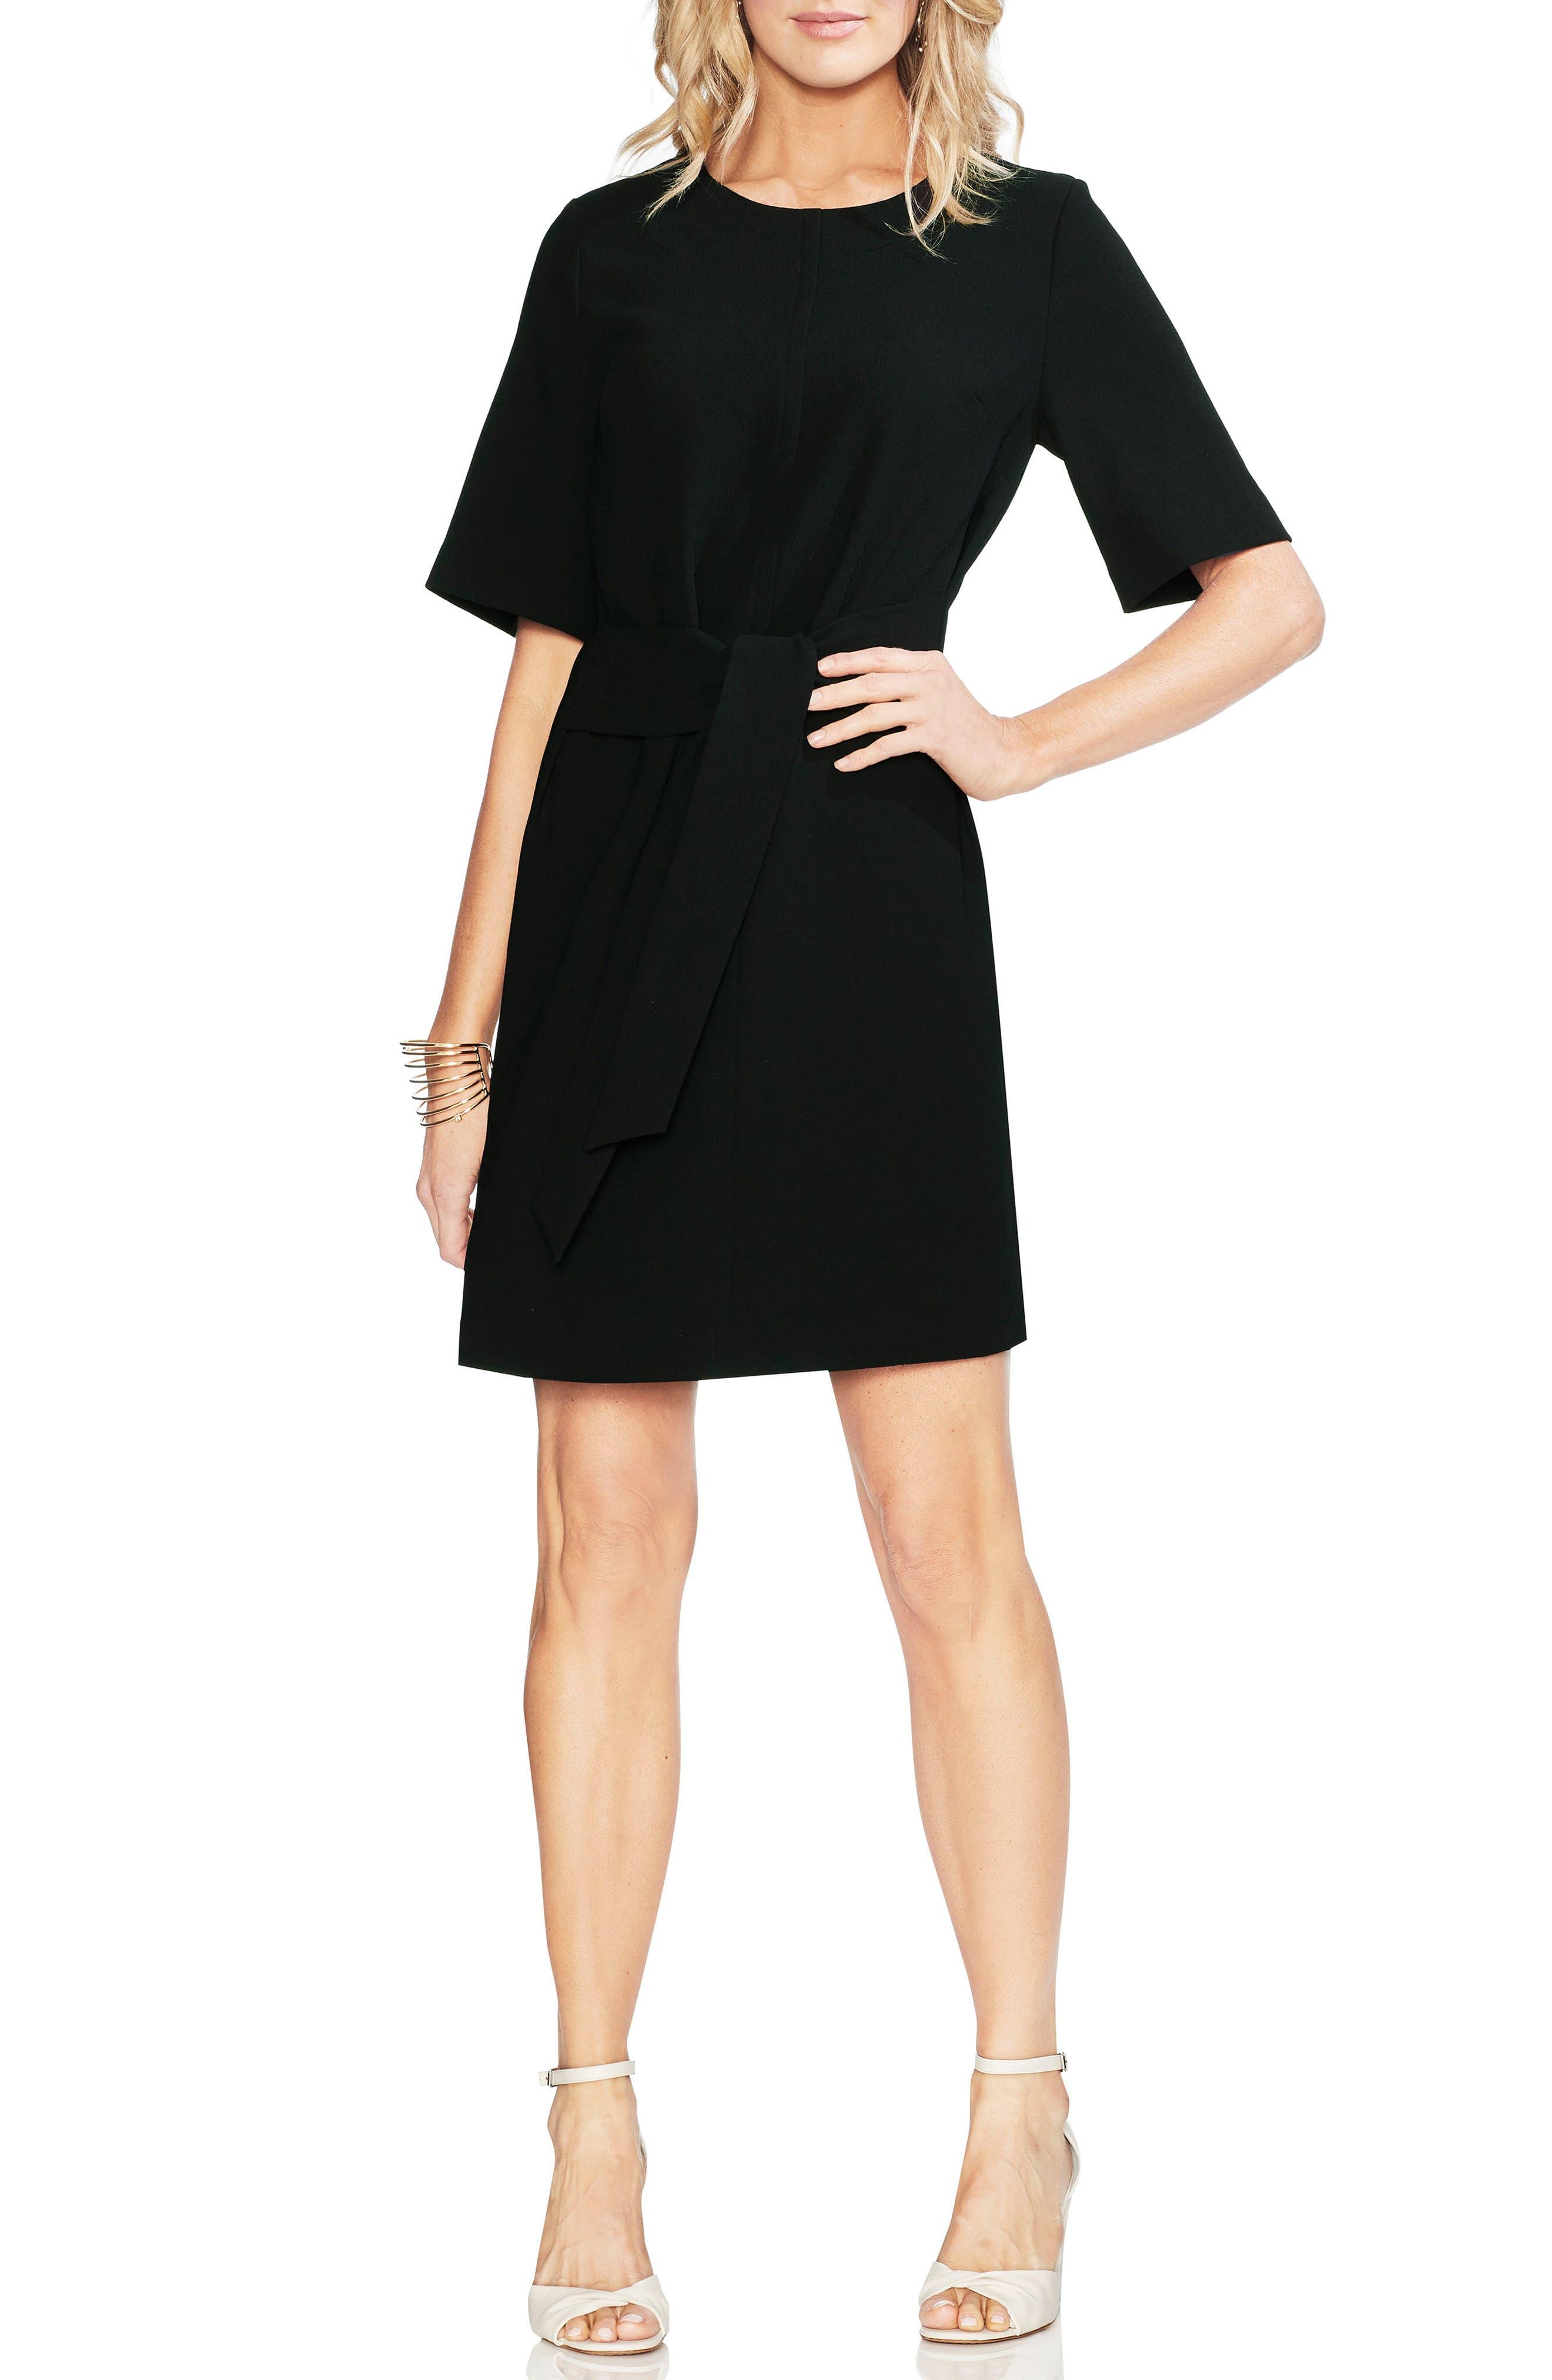 Petite Vince Camuto Belted Crepe Dress, Black